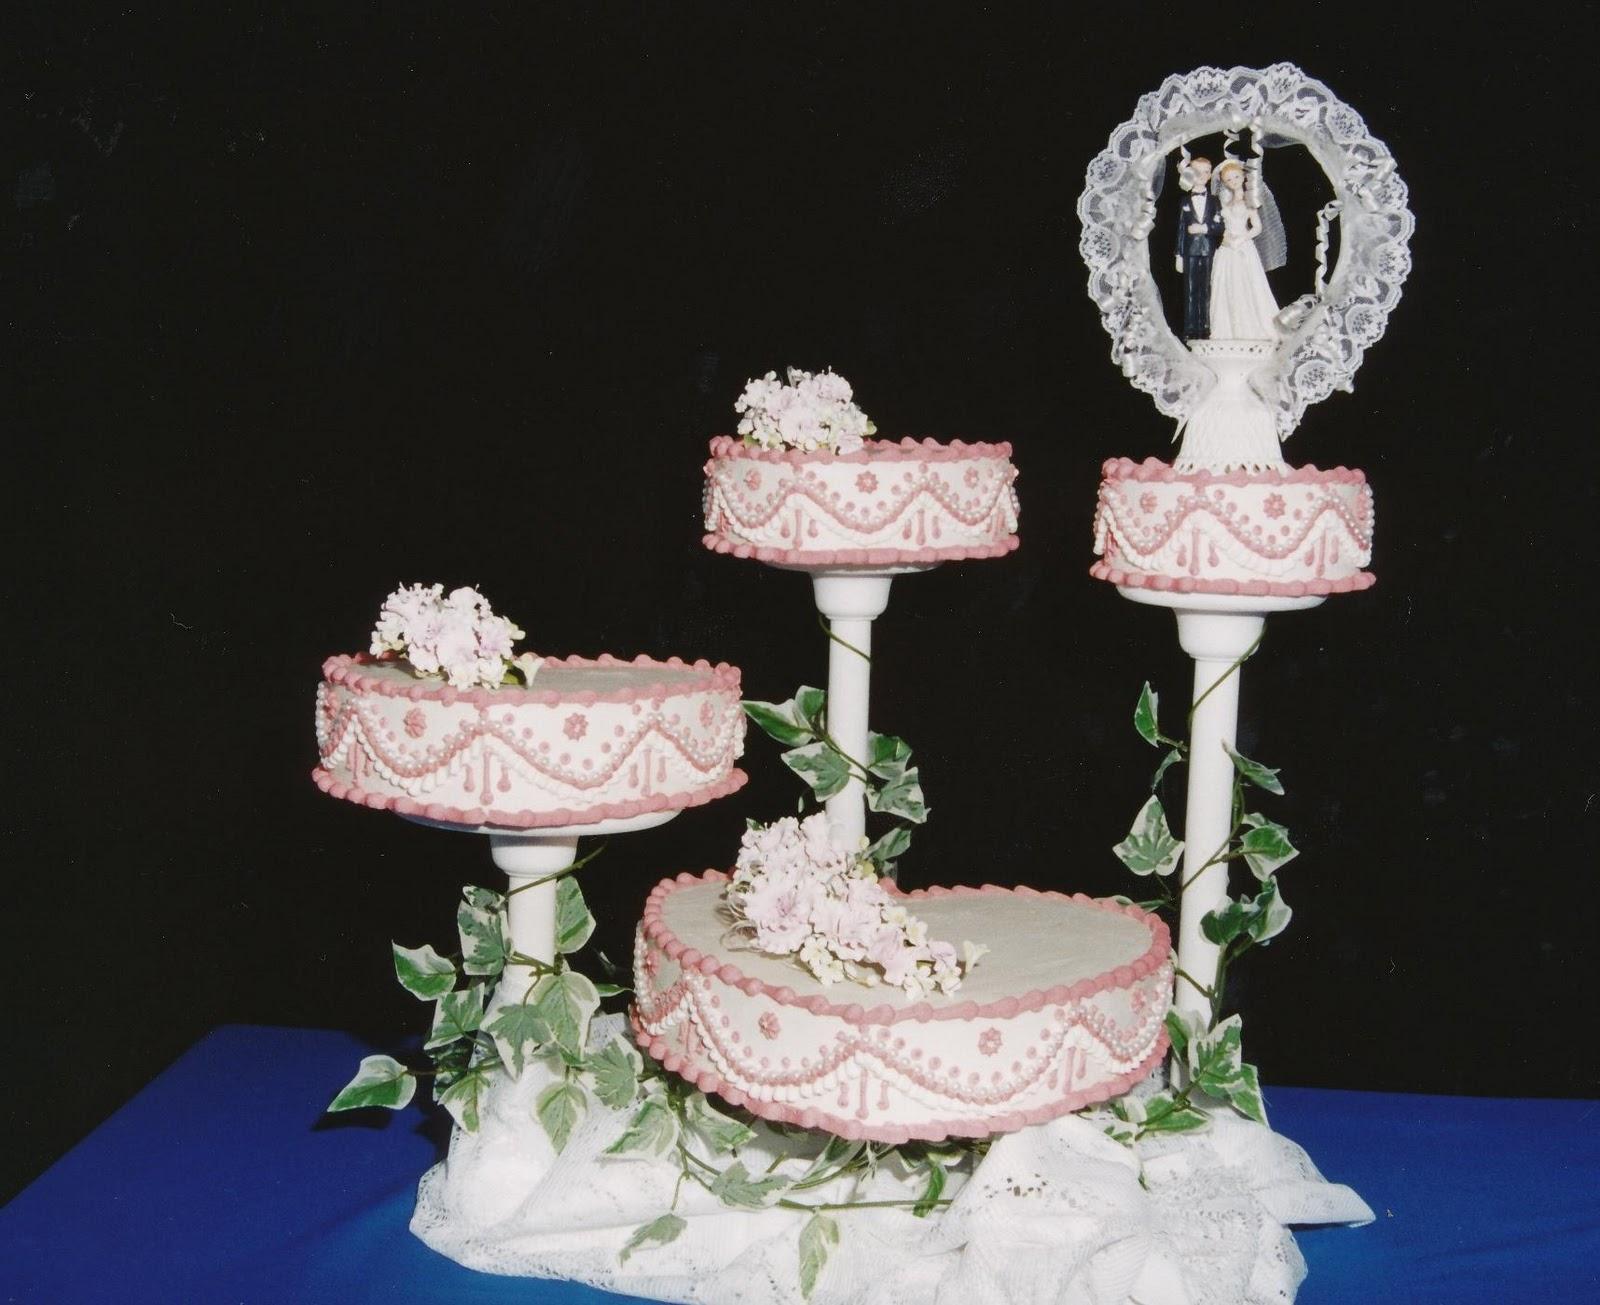 16 May 2010 Wedding Cakes  67     ? Wedding Cakes Wedding Cakes